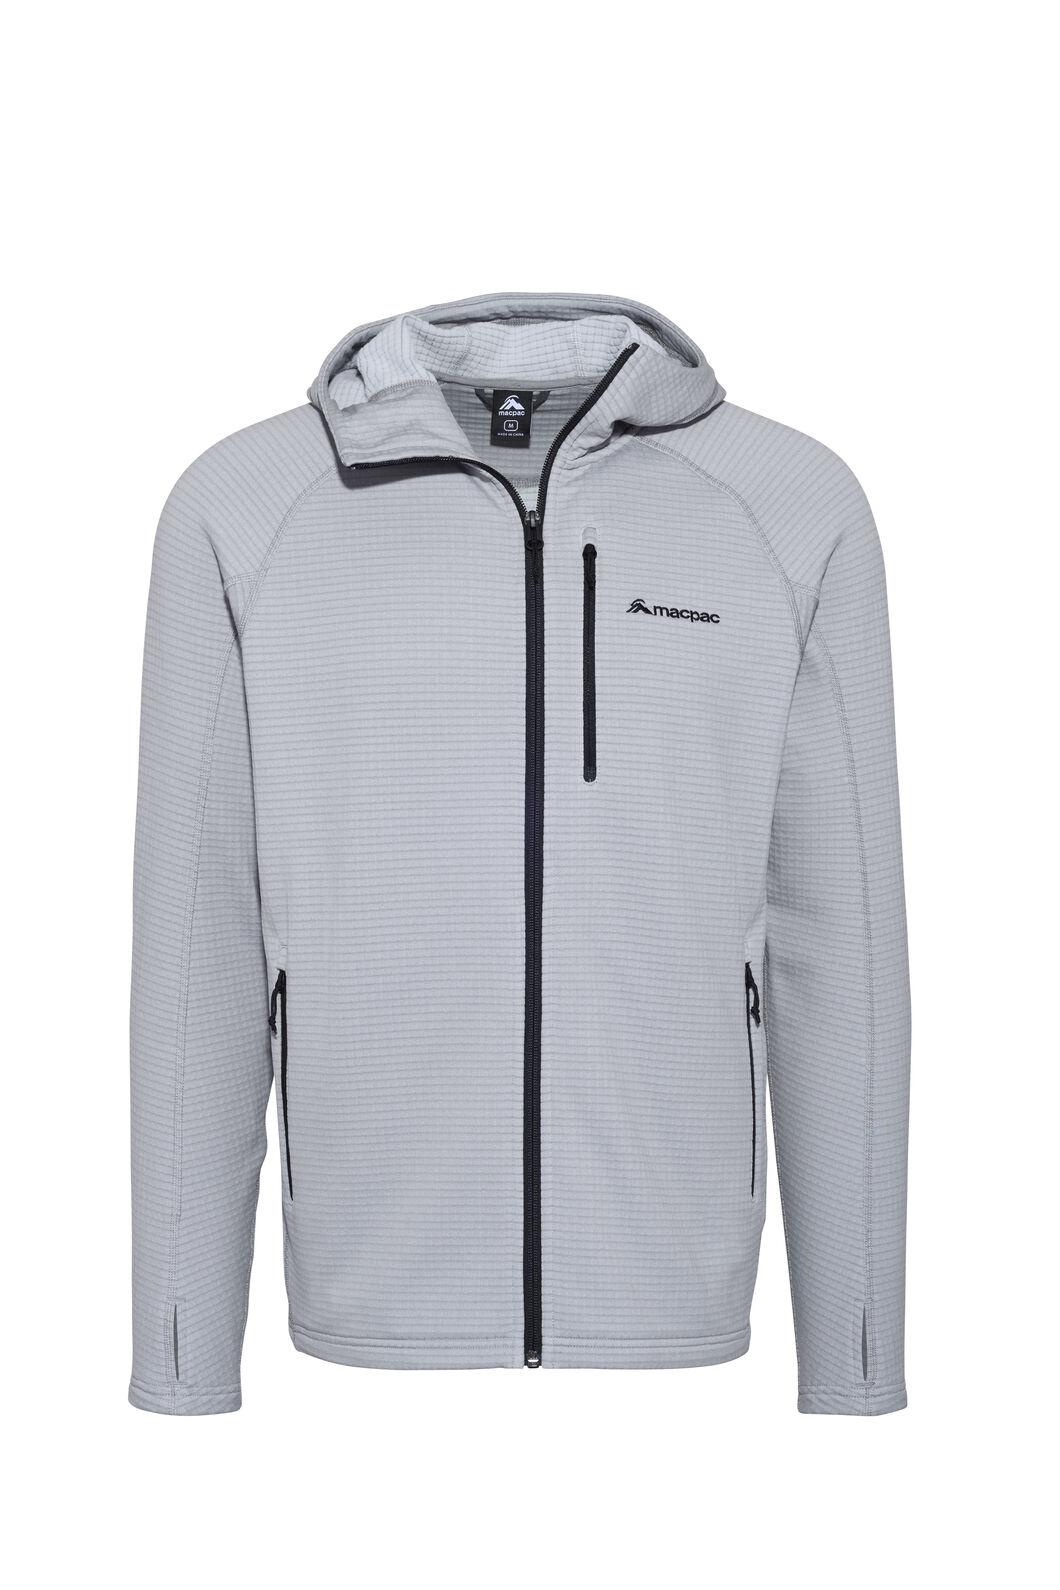 Macpac Ion Polartec® Fleece Hooded Jacket — Men's, Alloy, hi-res